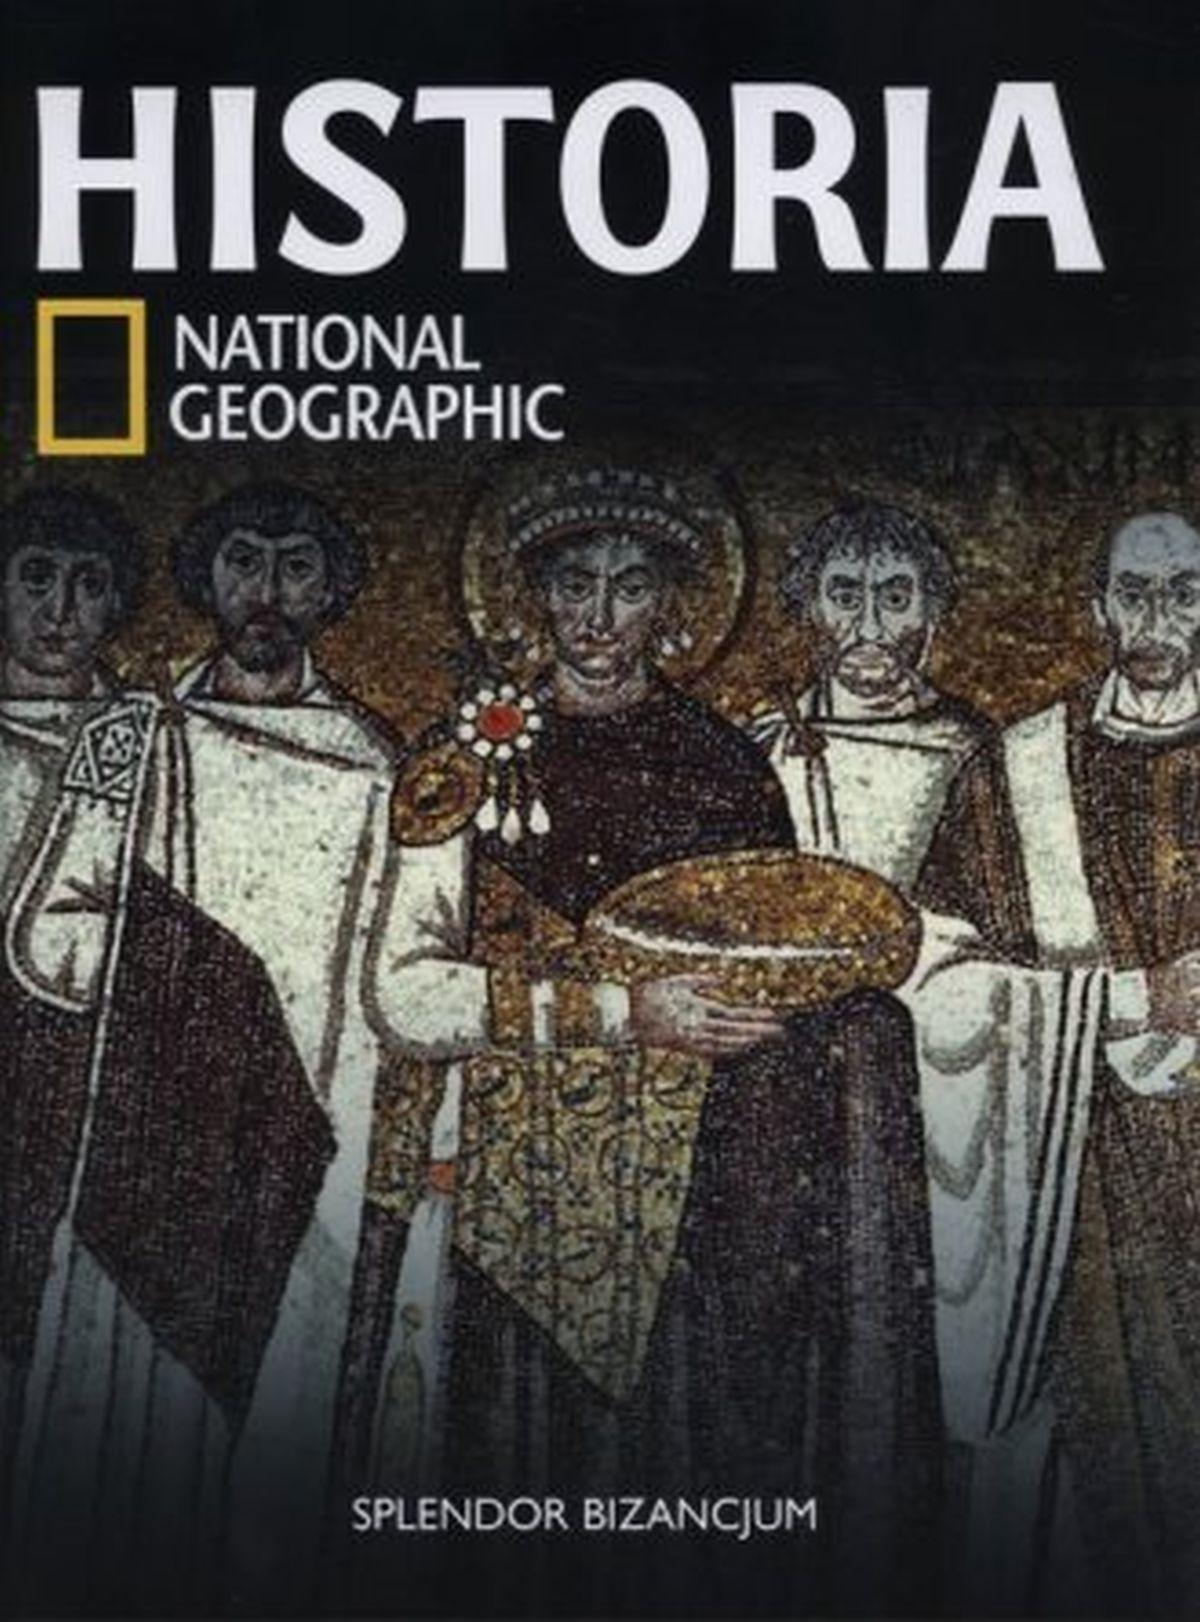 Historia National Geographis. Splendor Bizancjum